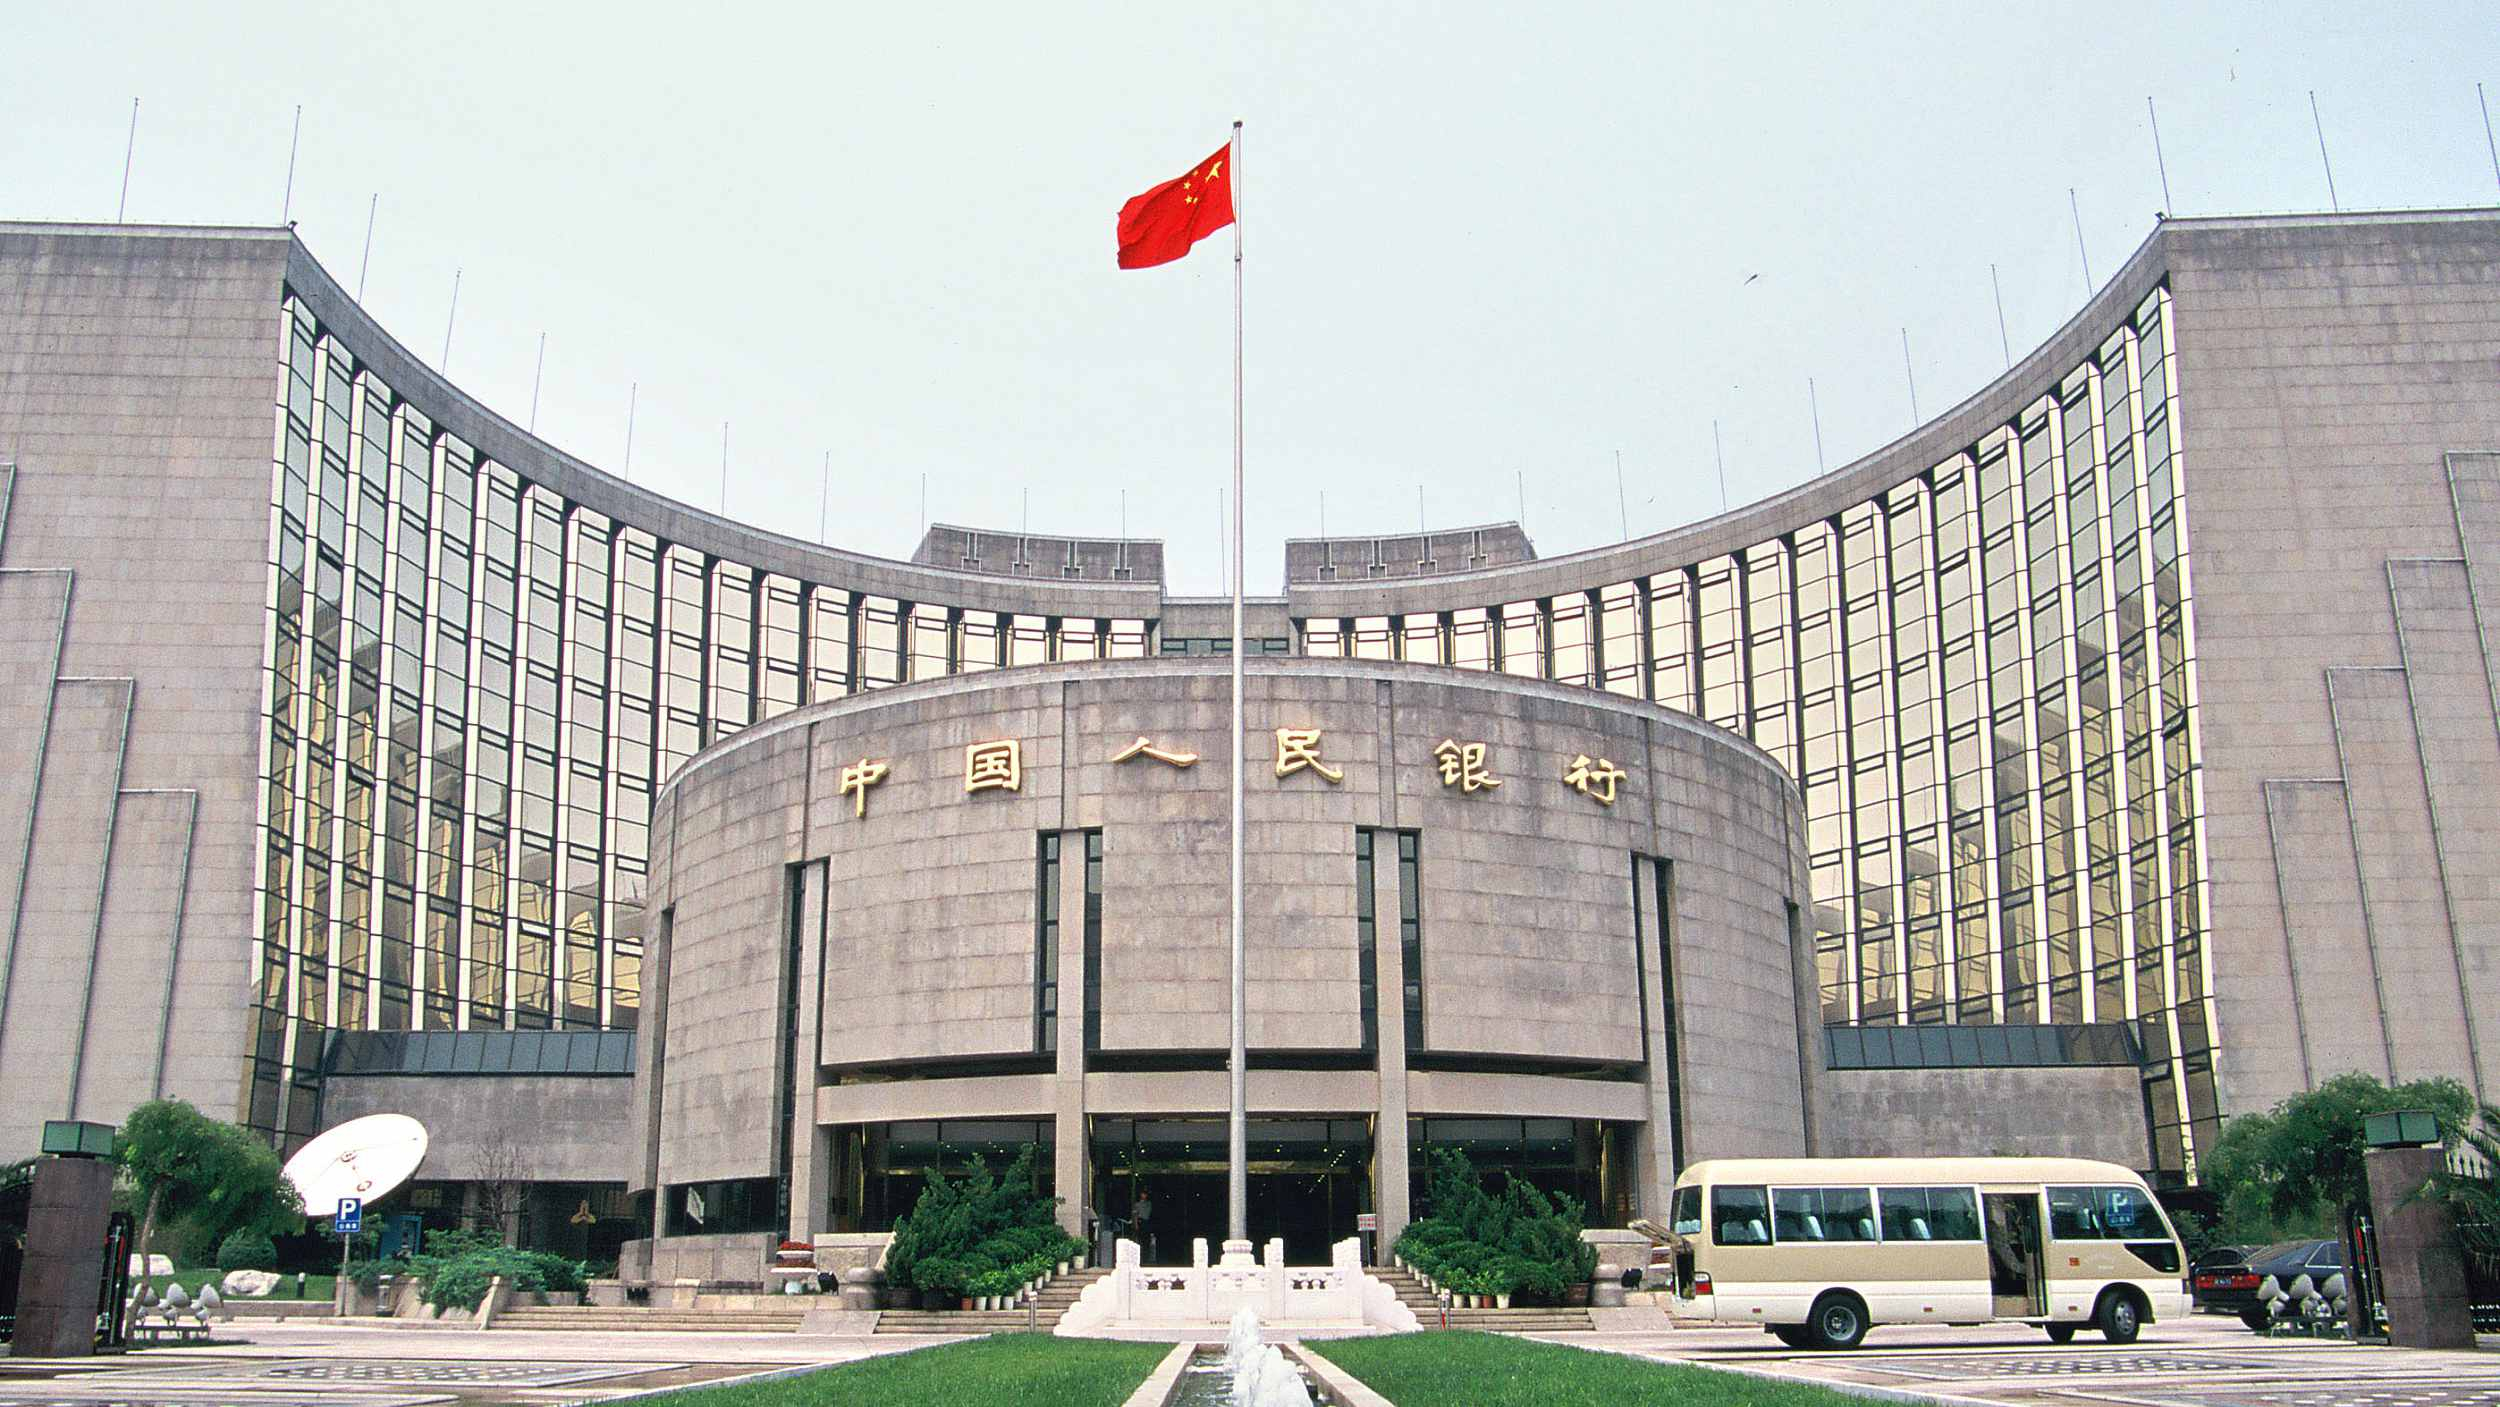 China's central bank to issue 10 bln yuan of bills in Hong Kong